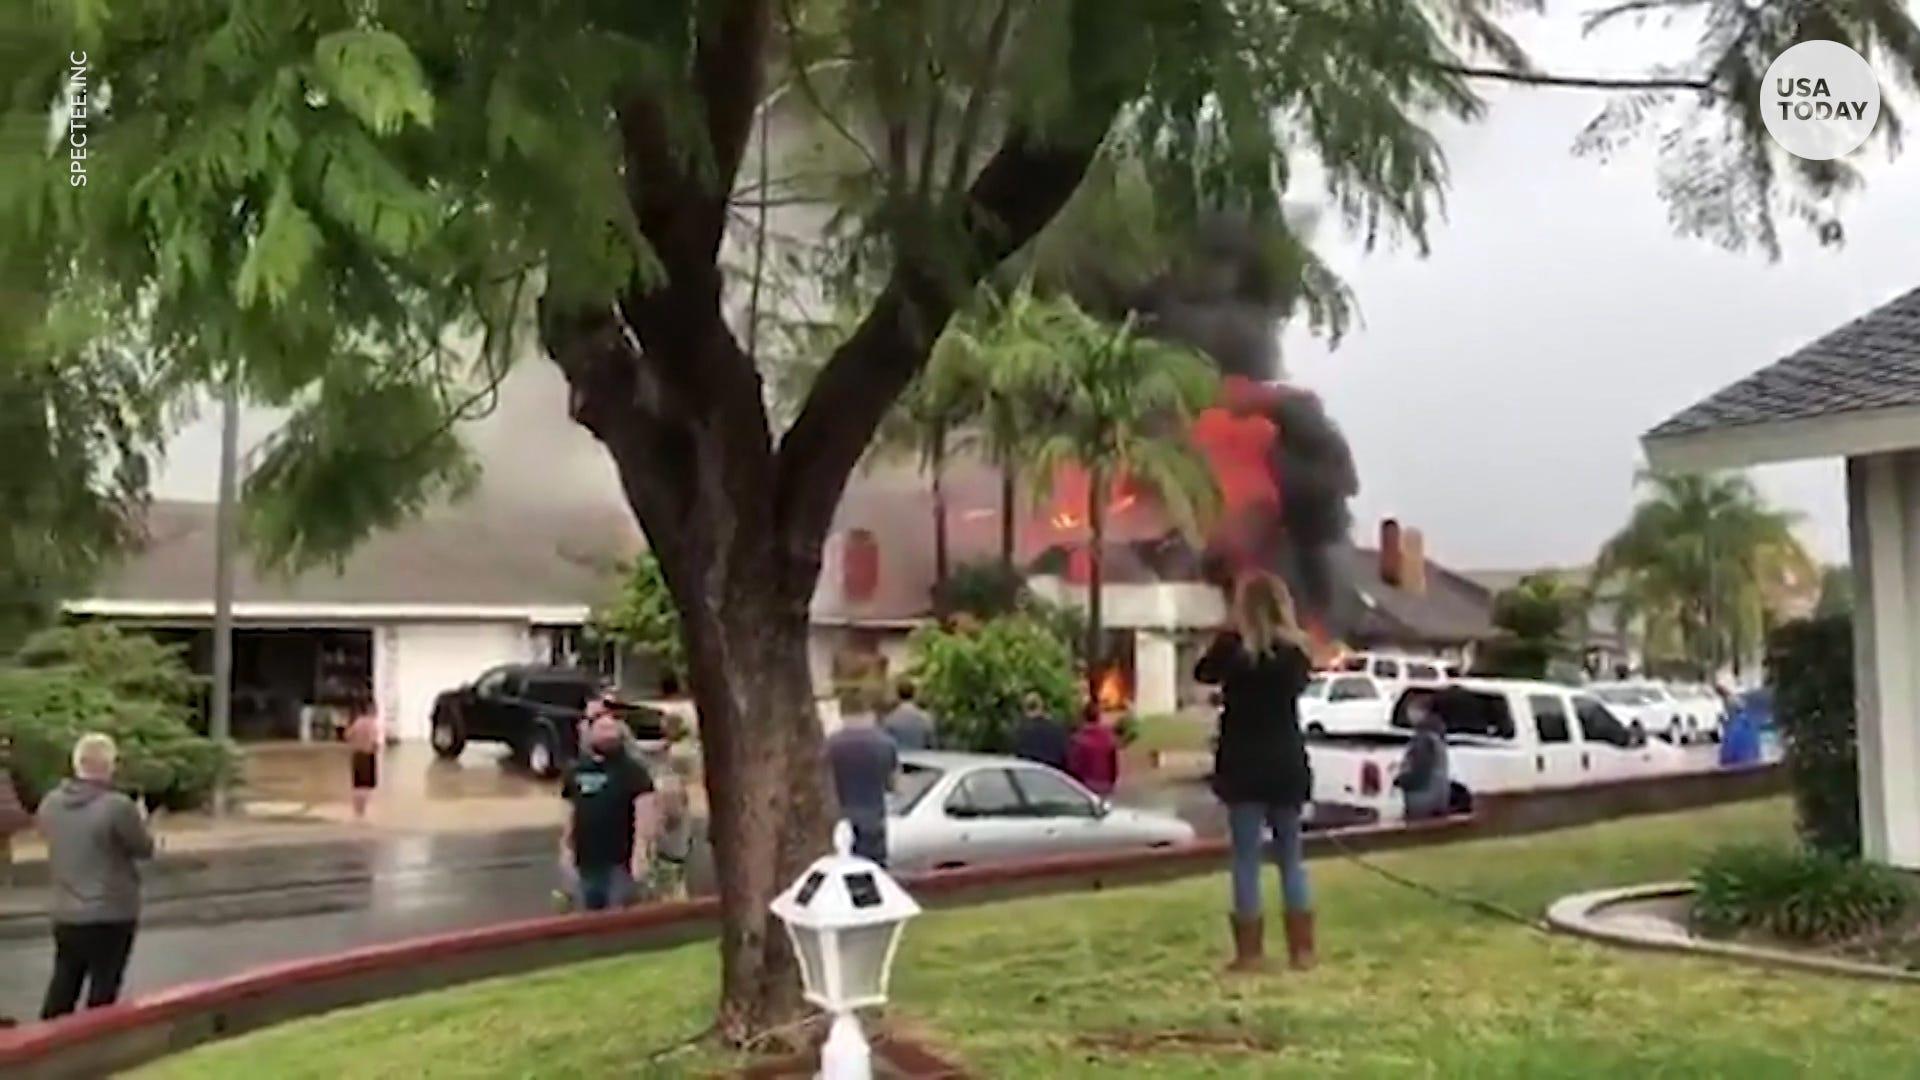 Plane crashes into neighborhood in Yorba Linda, California